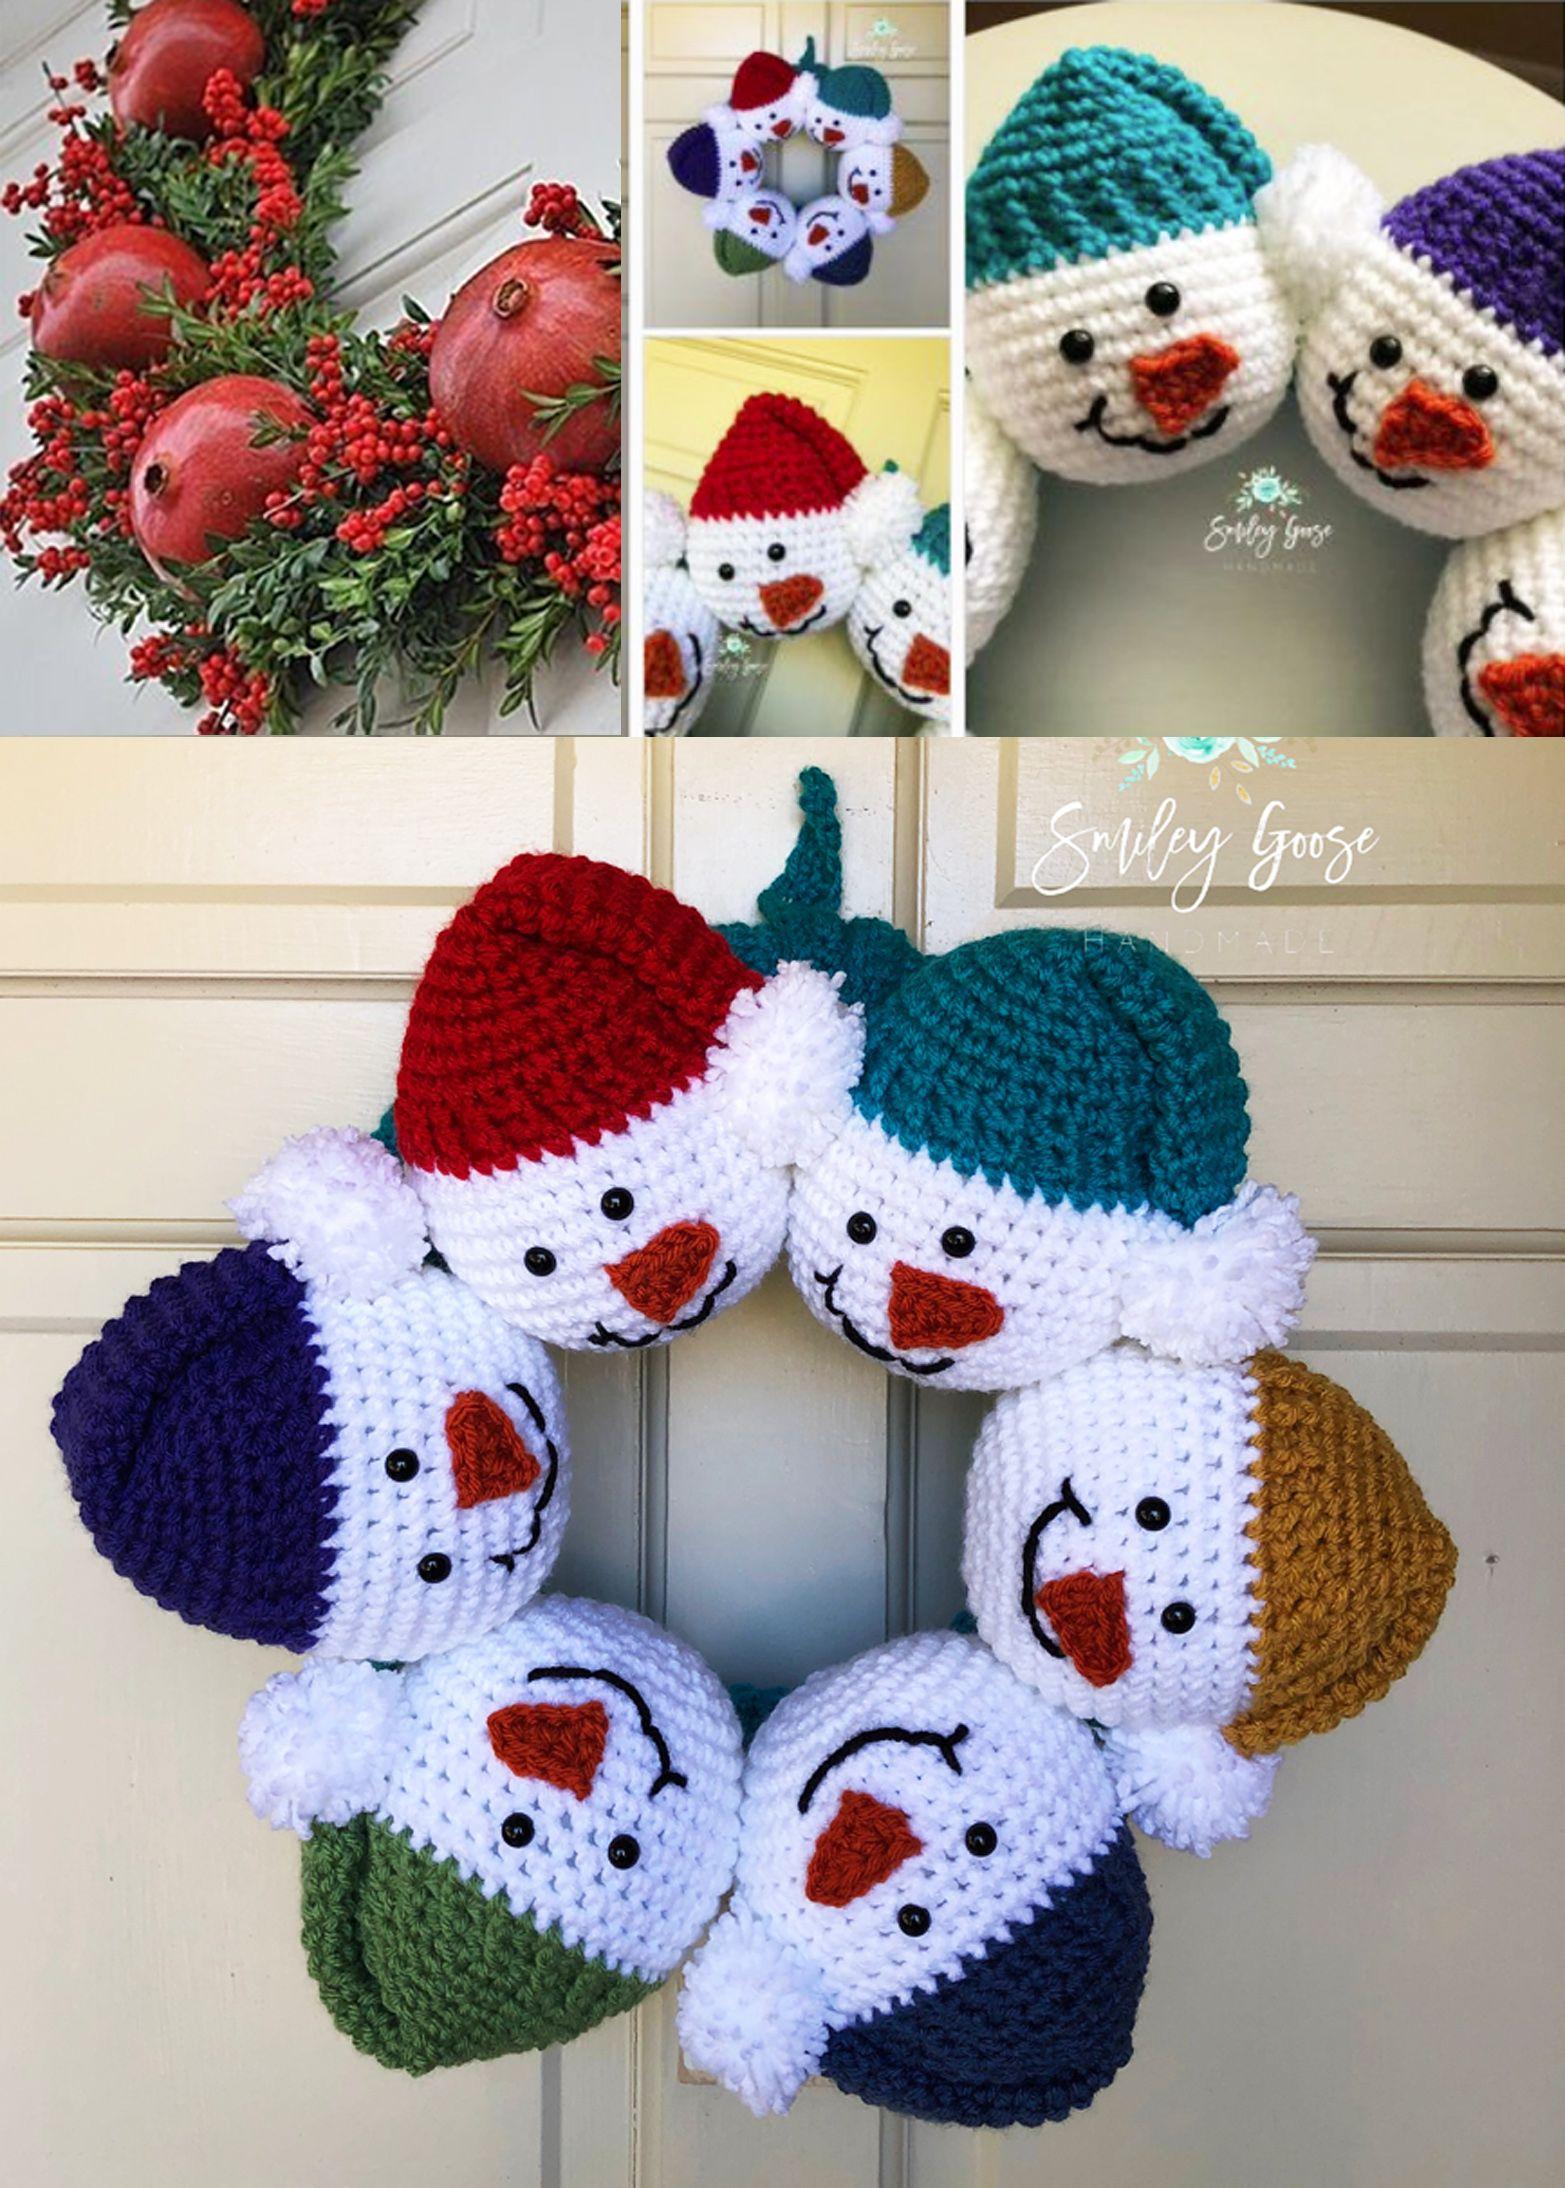 Snowman Christmas Wreath Crochet Magic Crochet Christmas Decorations Crochet Christmas Ornaments Free Christmas Crochet Patterns